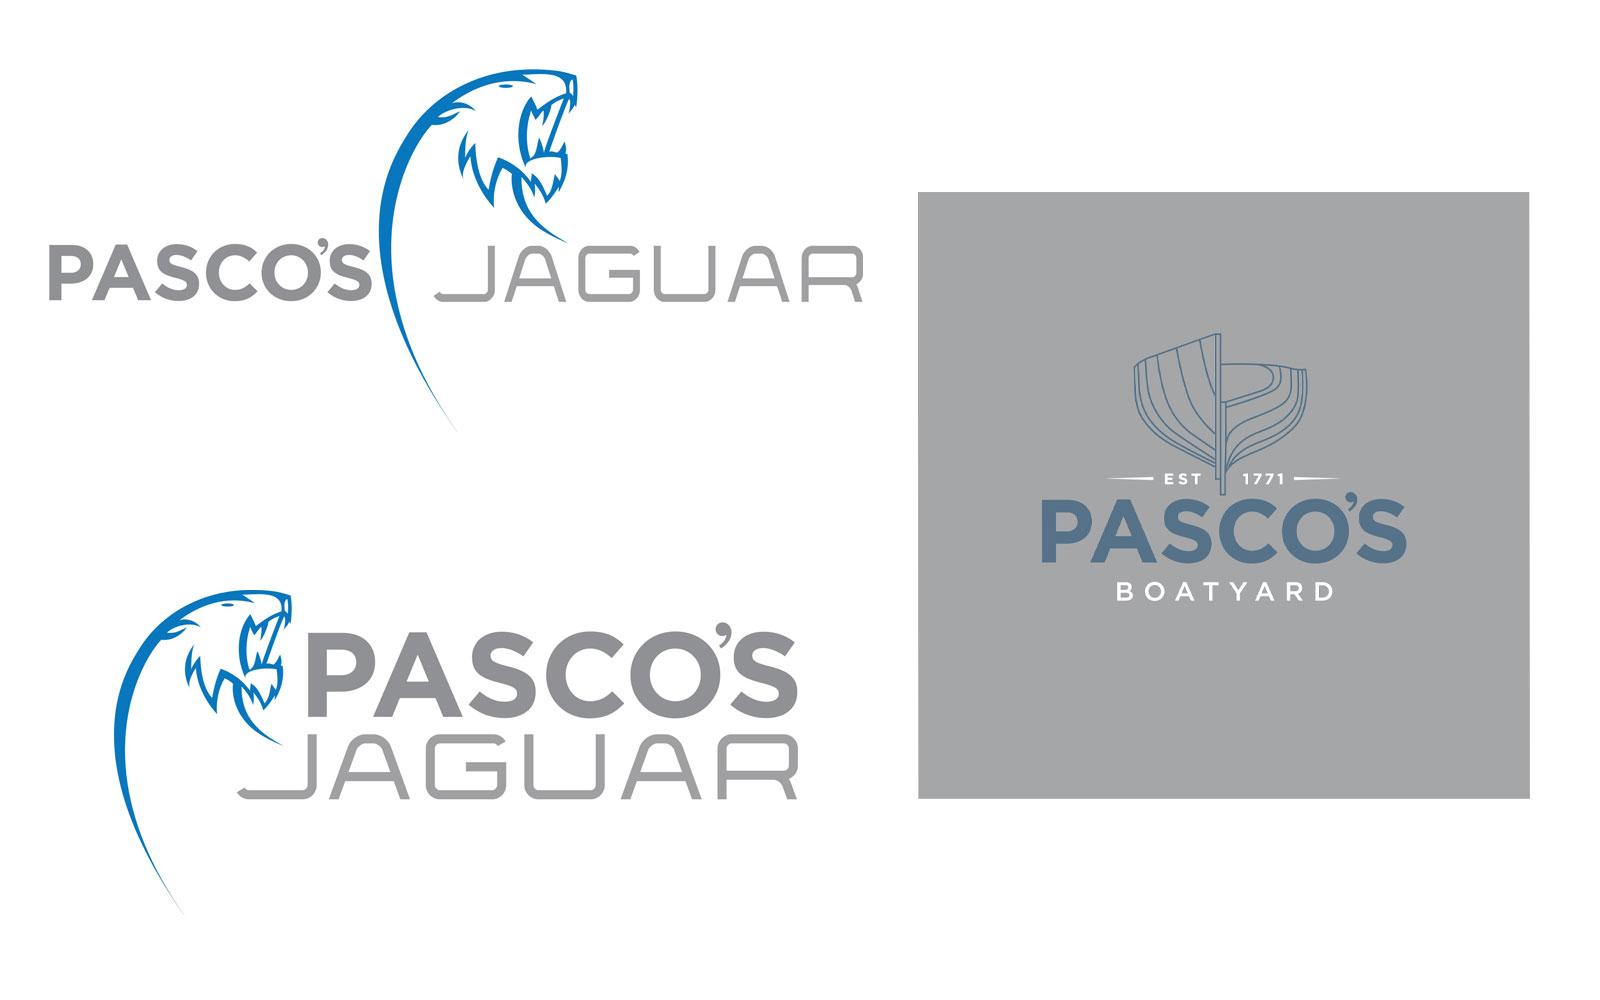 Pasco's-Boatyard-Logos-LR